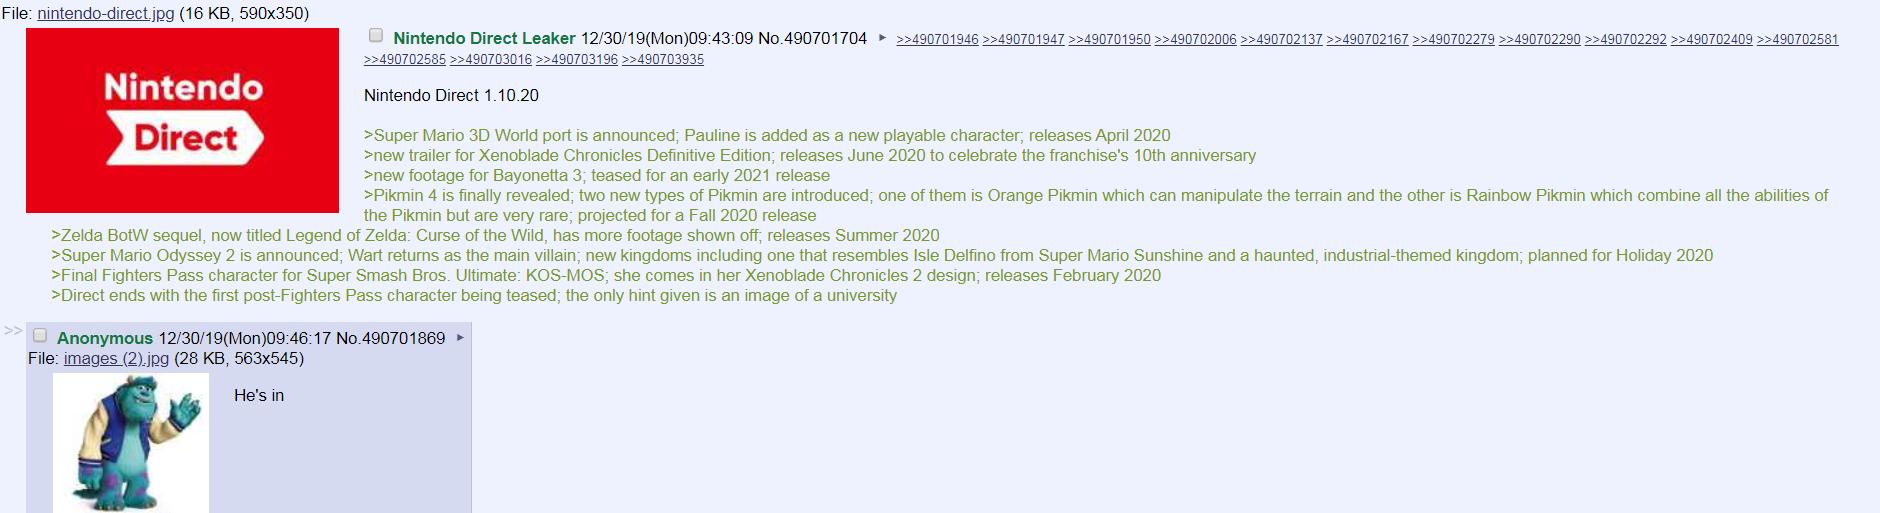 『Nintendo Direct』20200110海外リーク